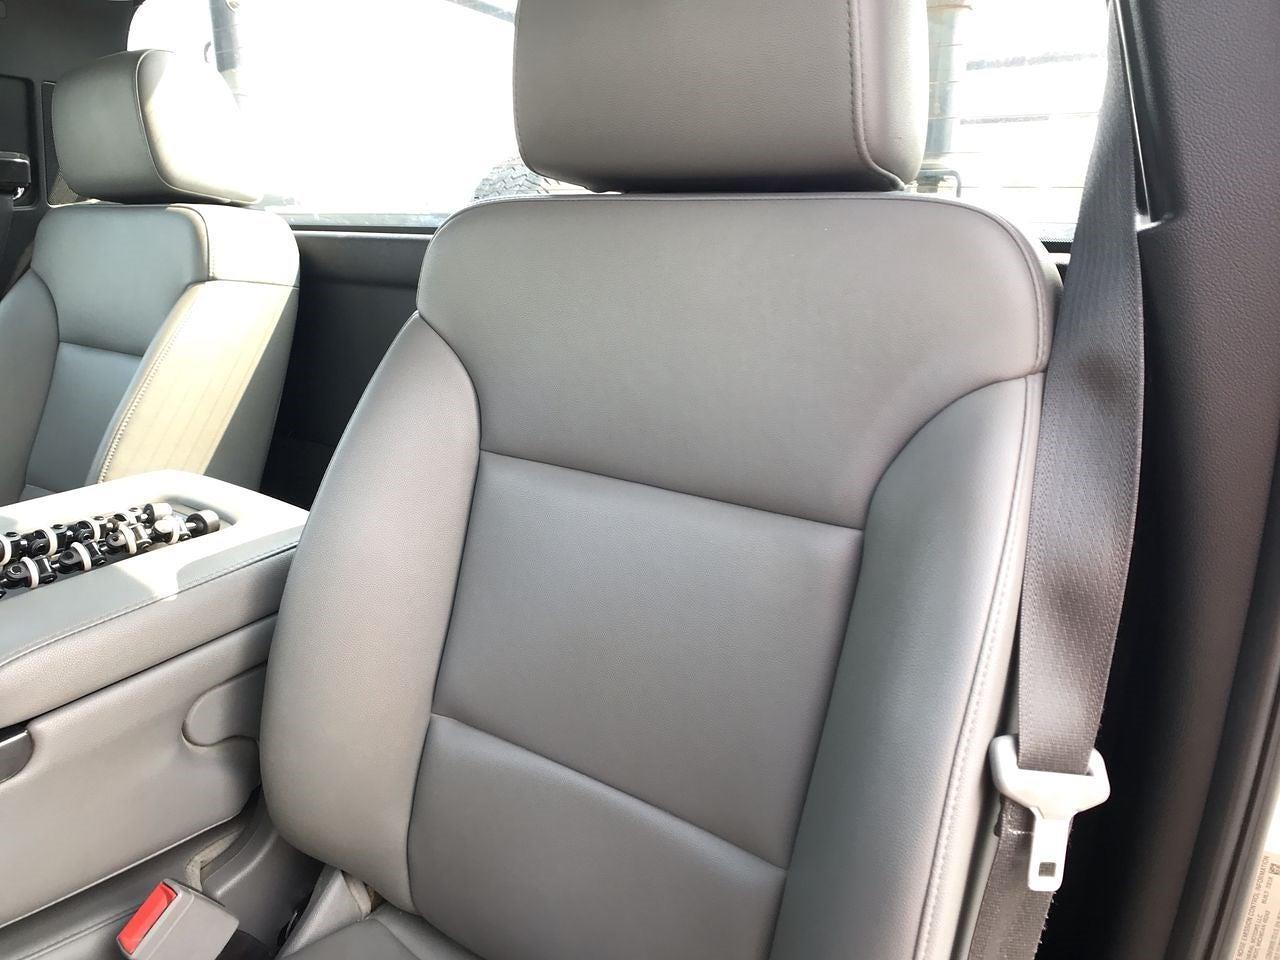 2018 Silverado 3500 Regular Cab 4x4,  Service Body #112025 - photo 11